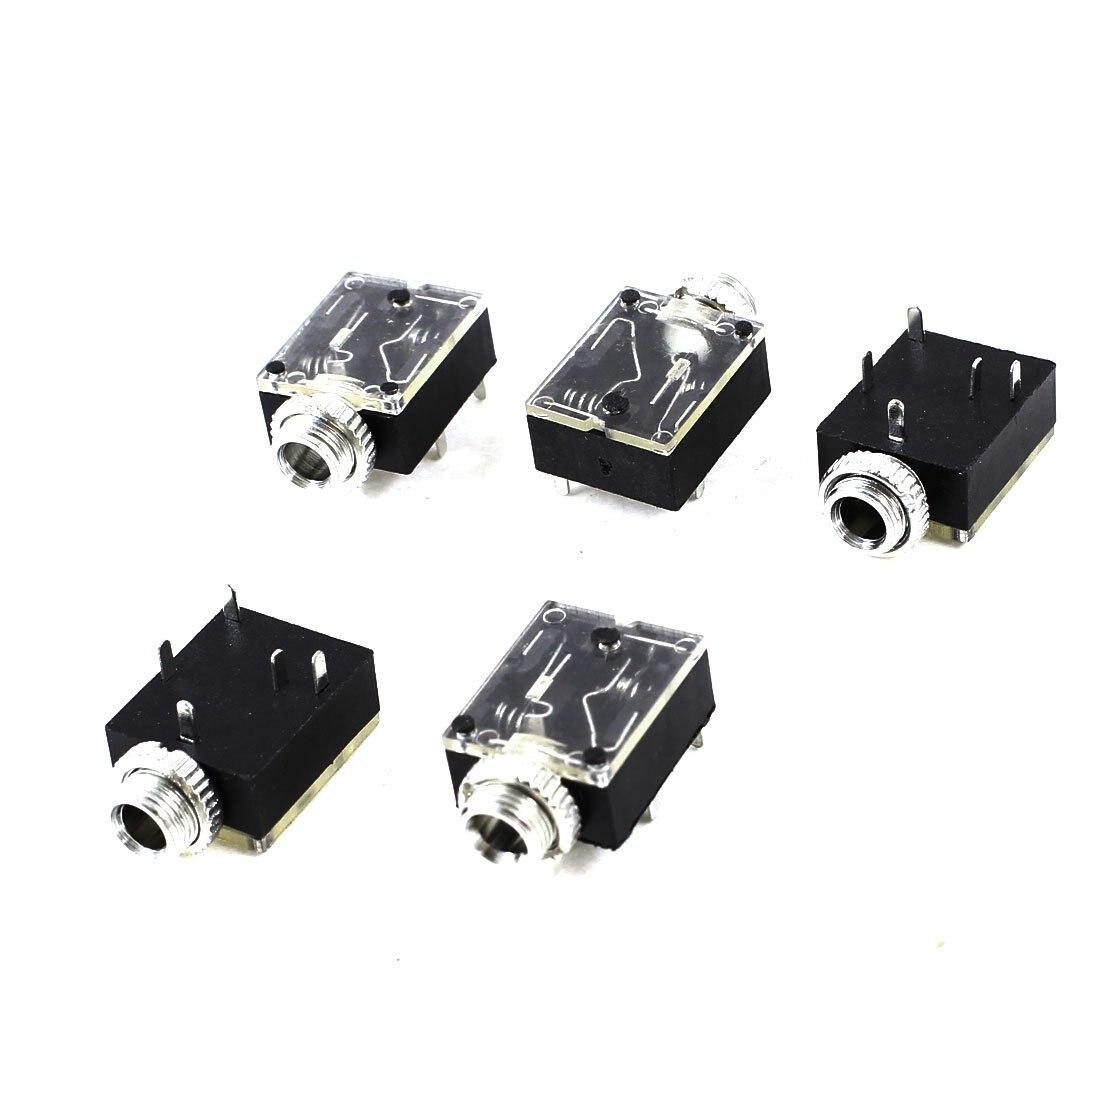 5 Pcs 5 Pin 3.5mm Audio Mono Jack Socket PCB Panel Mount for Headphone